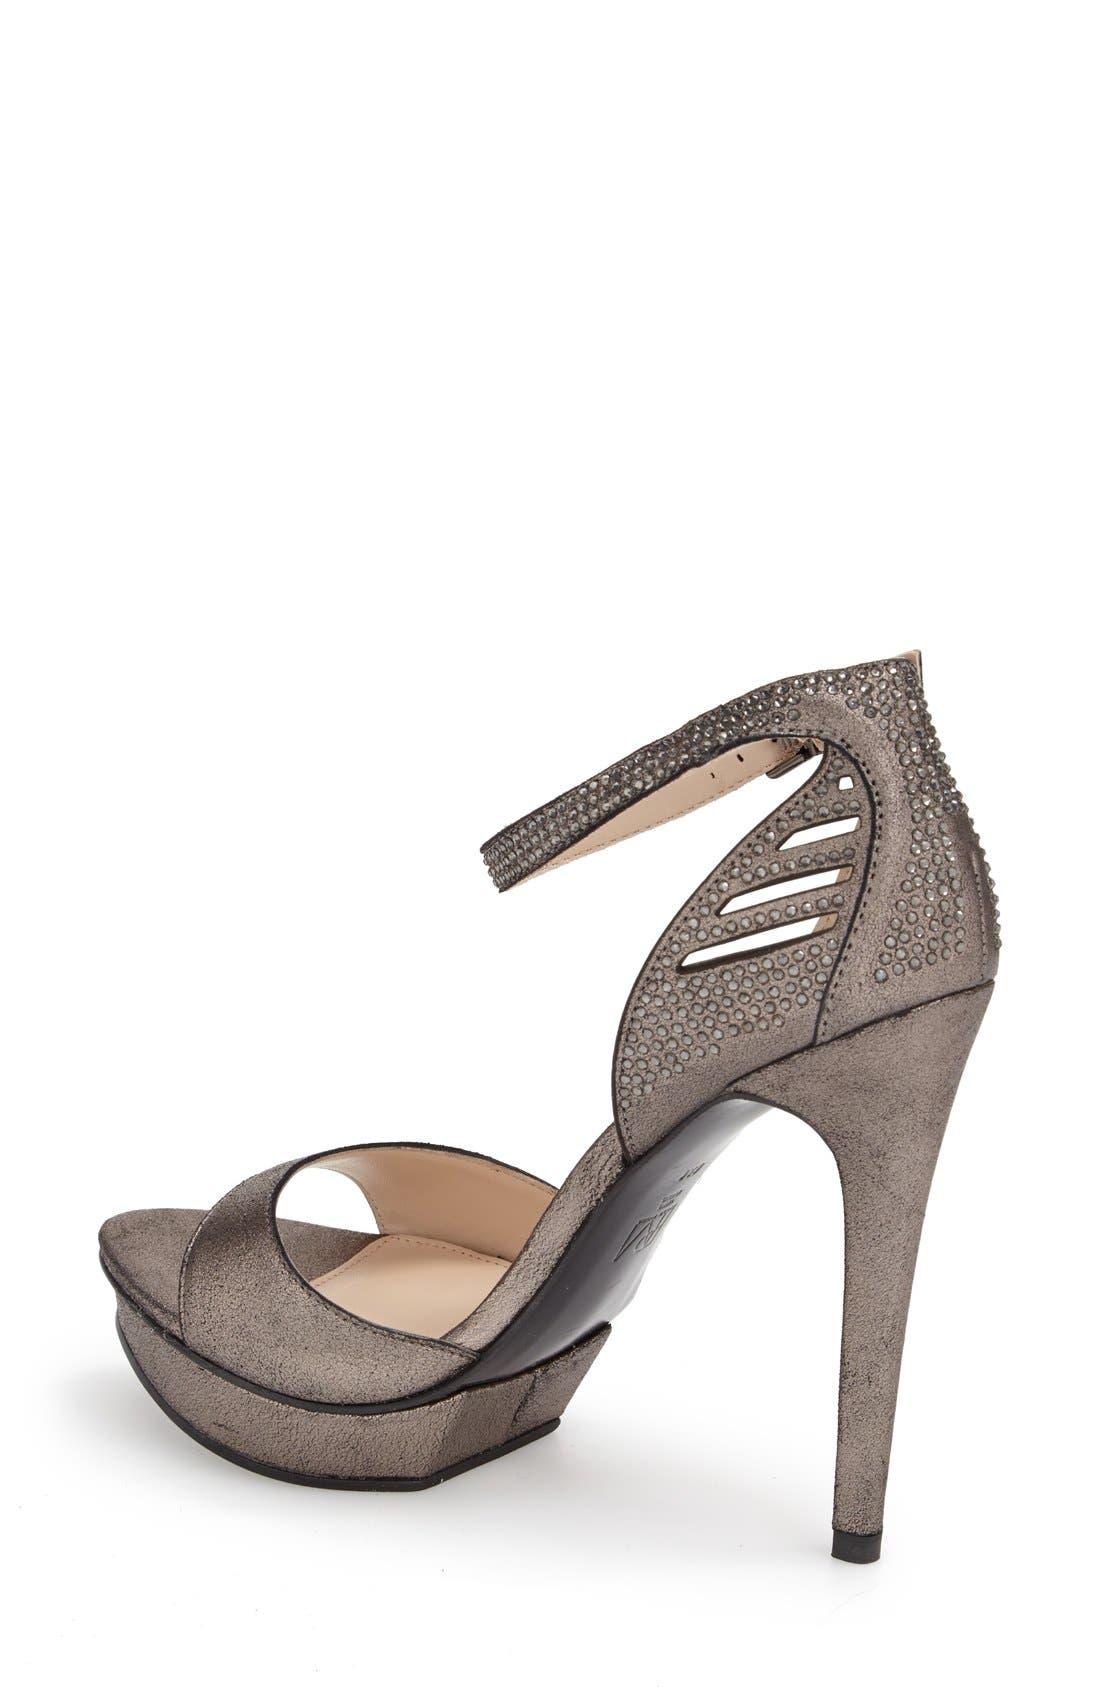 'Fenton' Ankle Strap Sandal,                             Alternate thumbnail 24, color,